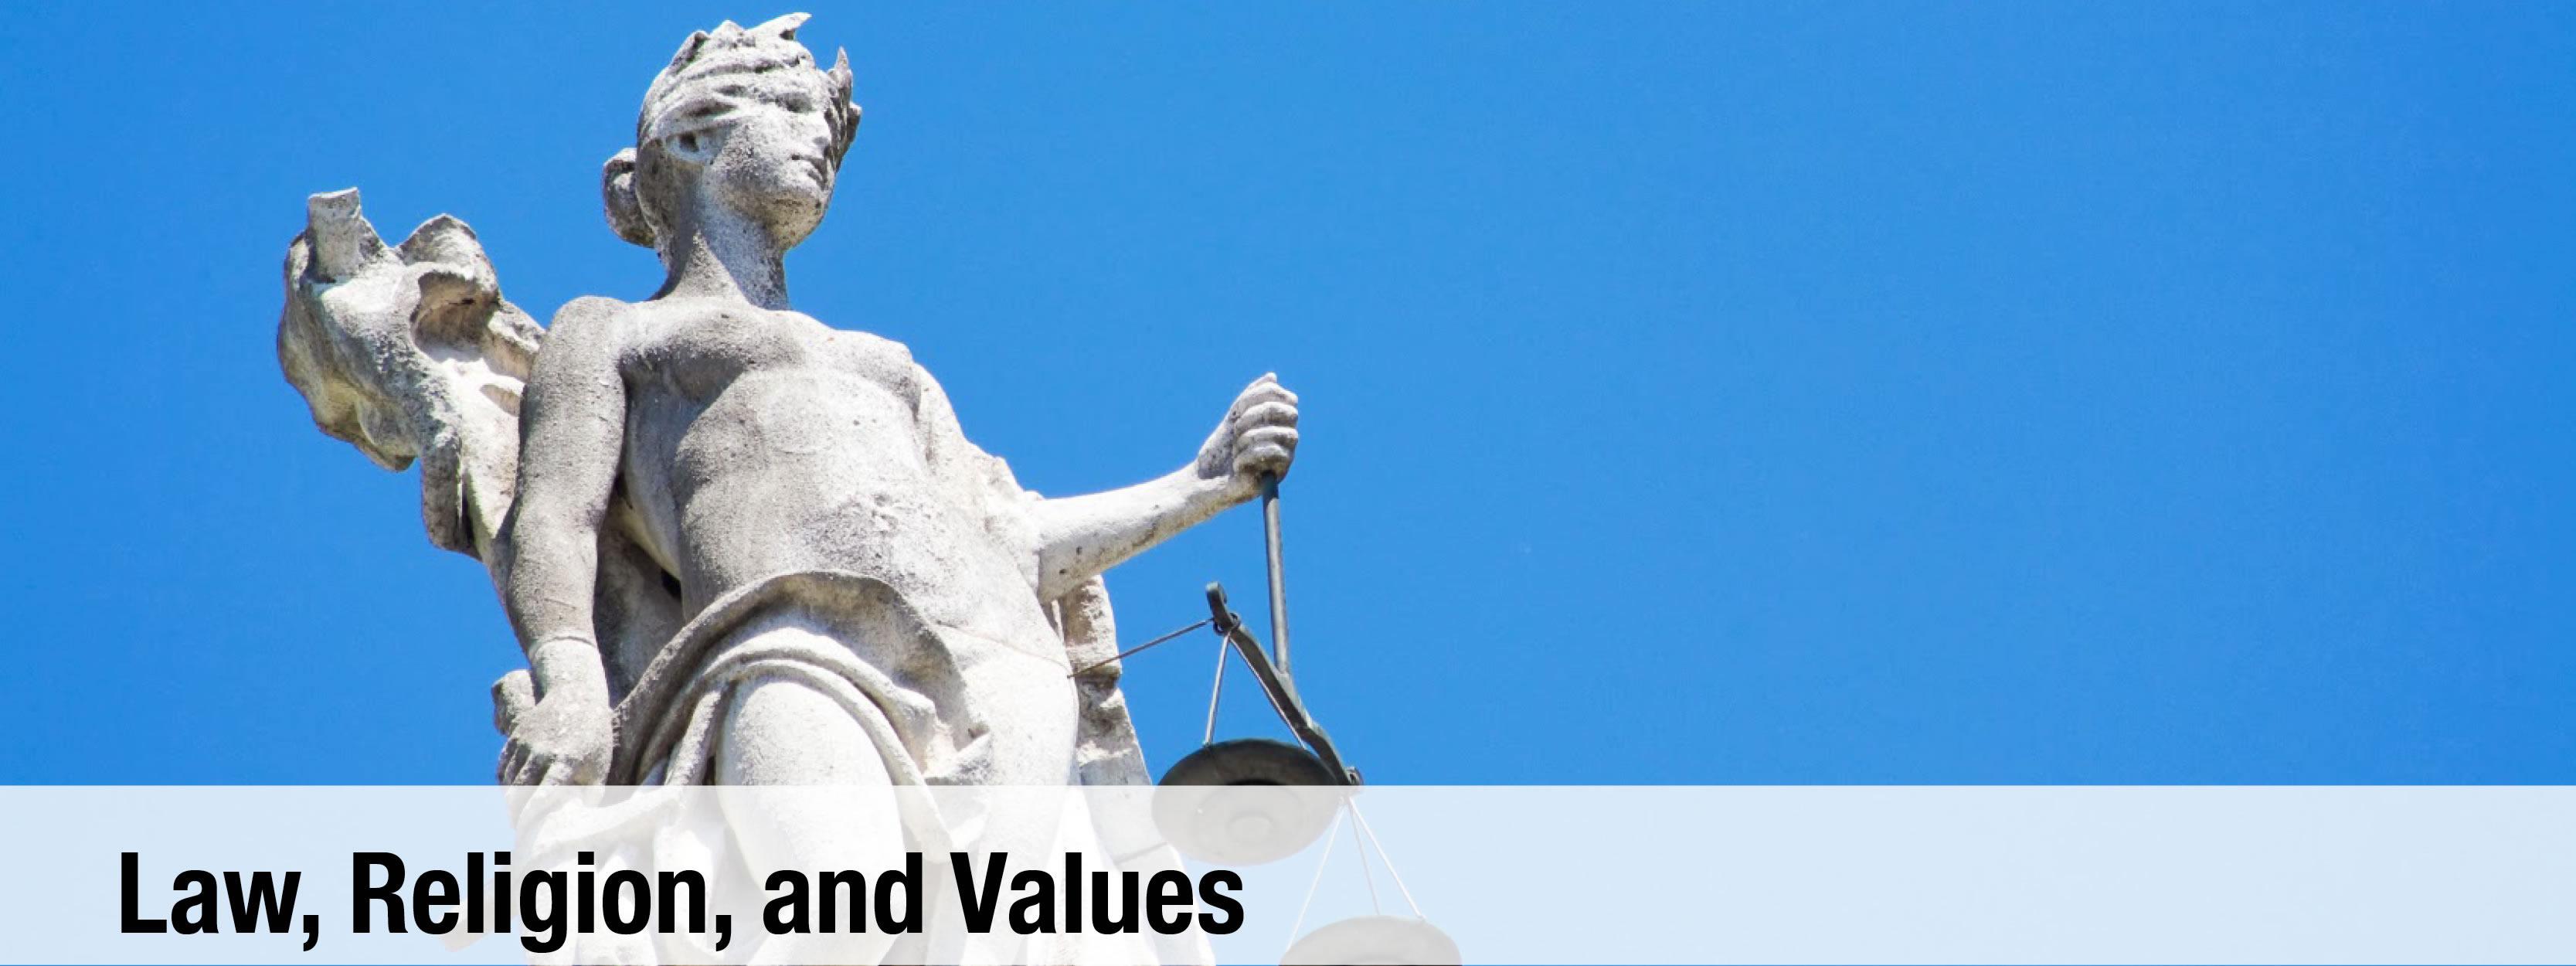 Lawreligionvalues redesign